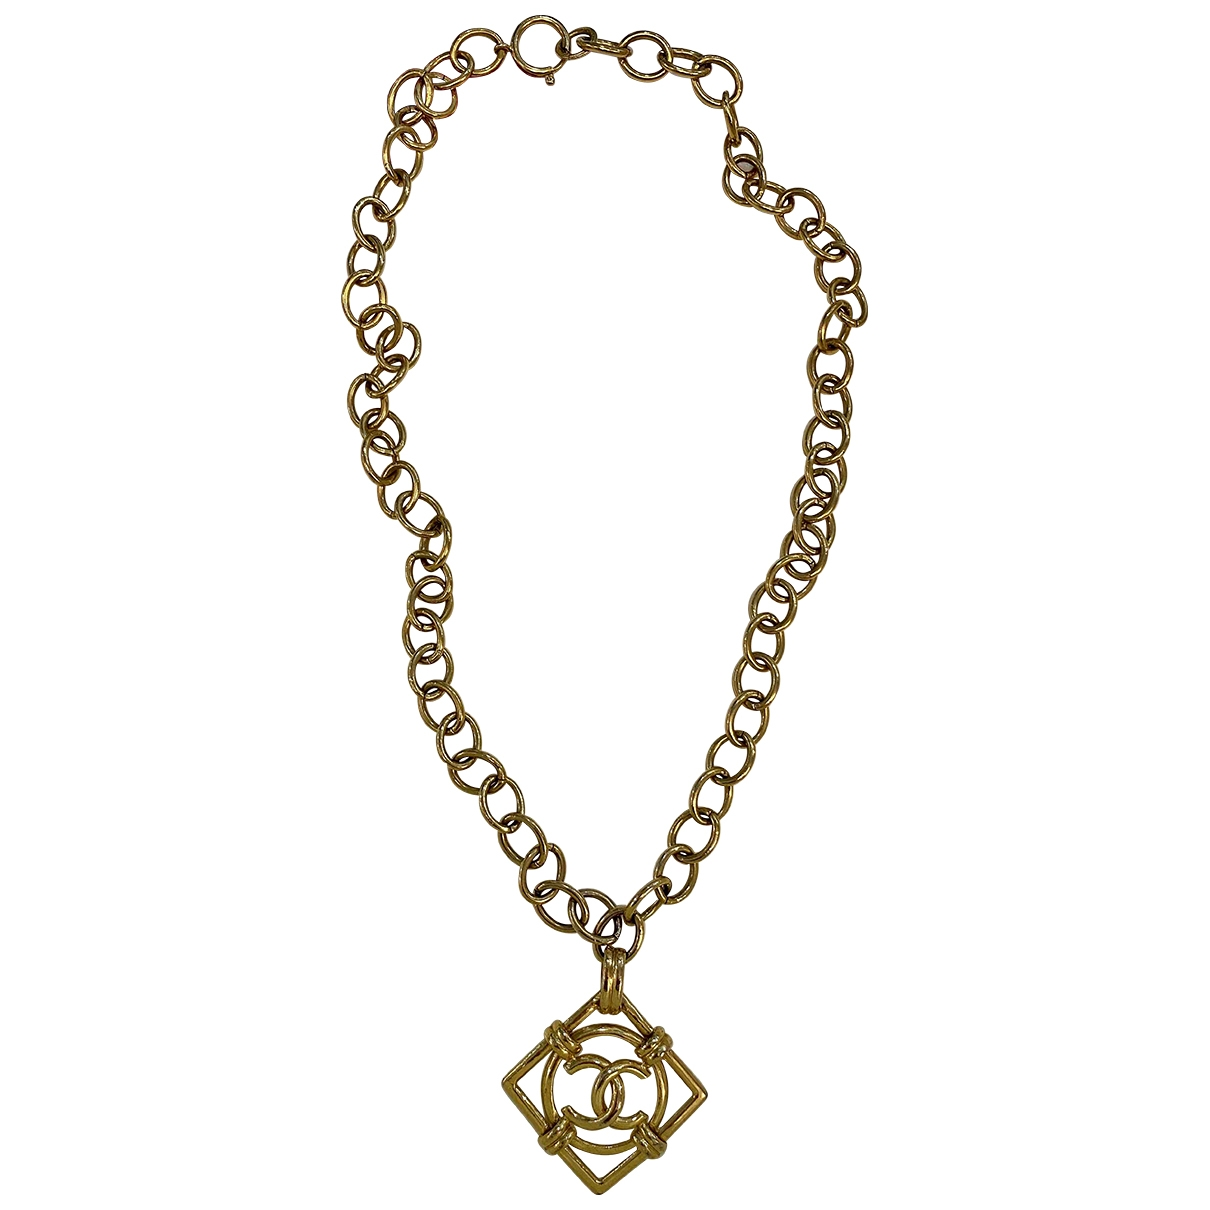 Collar largo Chanel